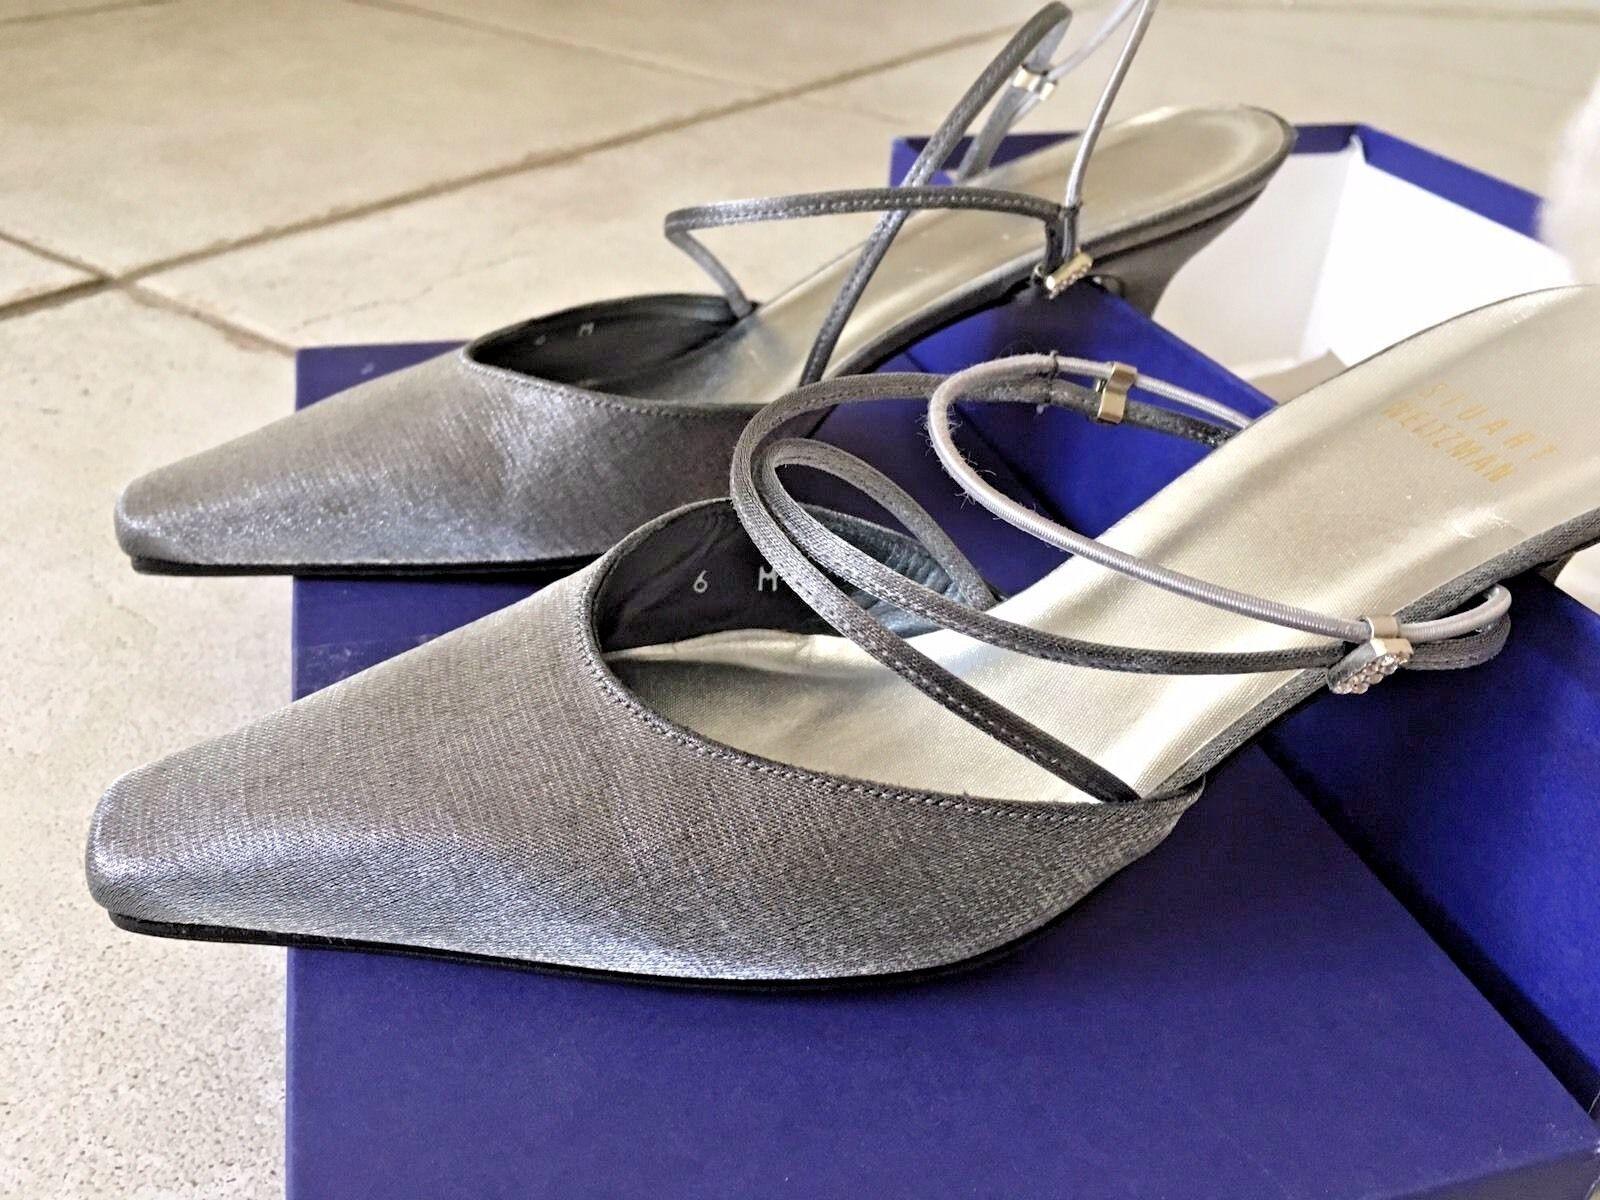 NEW Stuart Weitzman Pewter Sandals Slingback or Slip on Pumps 6M NWB